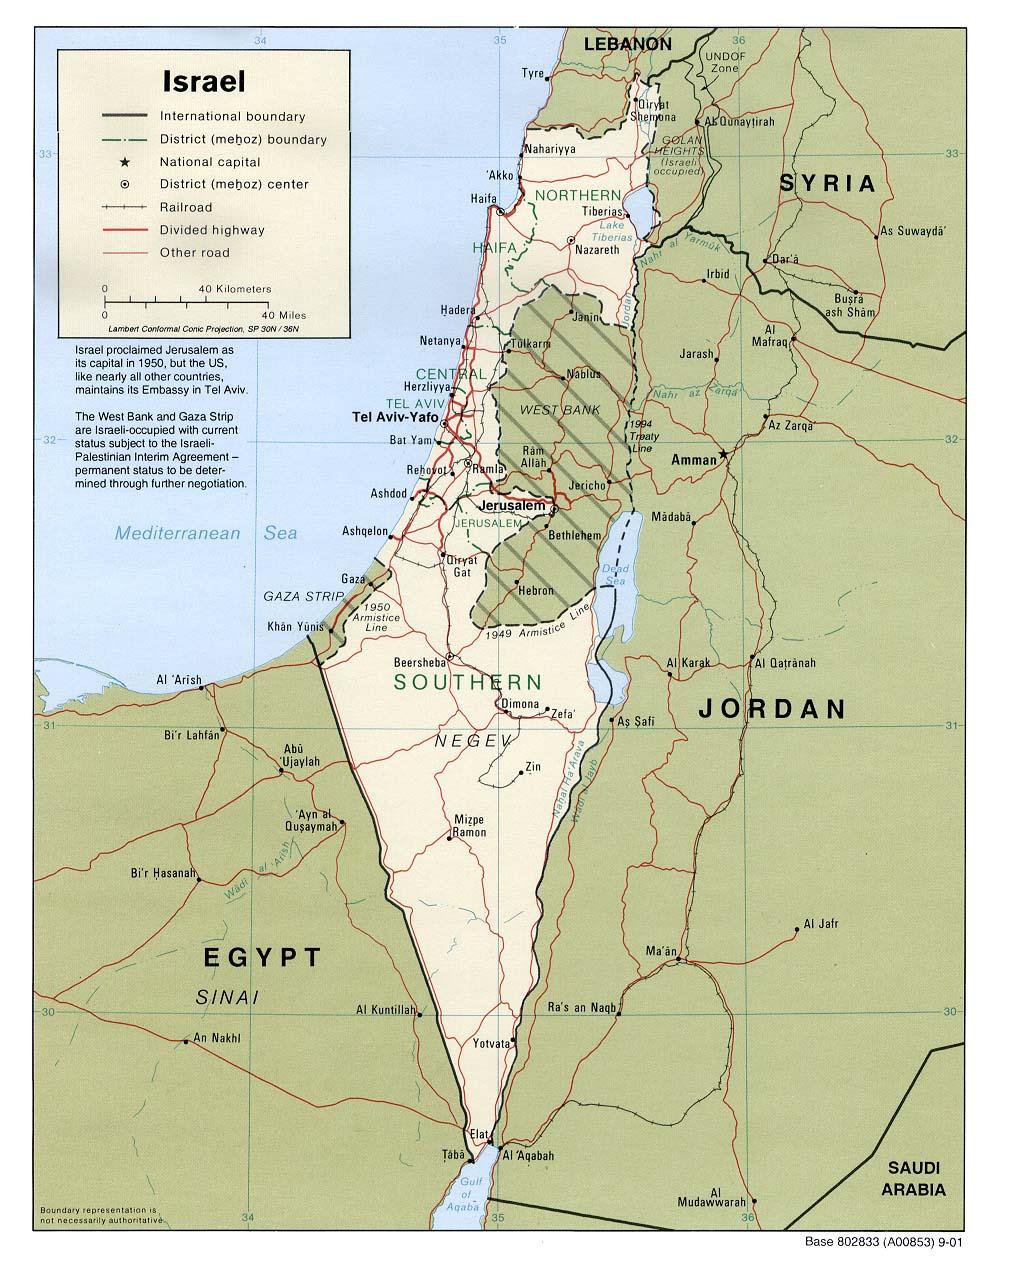 Ŝ�图 Ļ�色列地图 Israel ĺ�洲地图 Asia Maps Ǿ�景旅游网